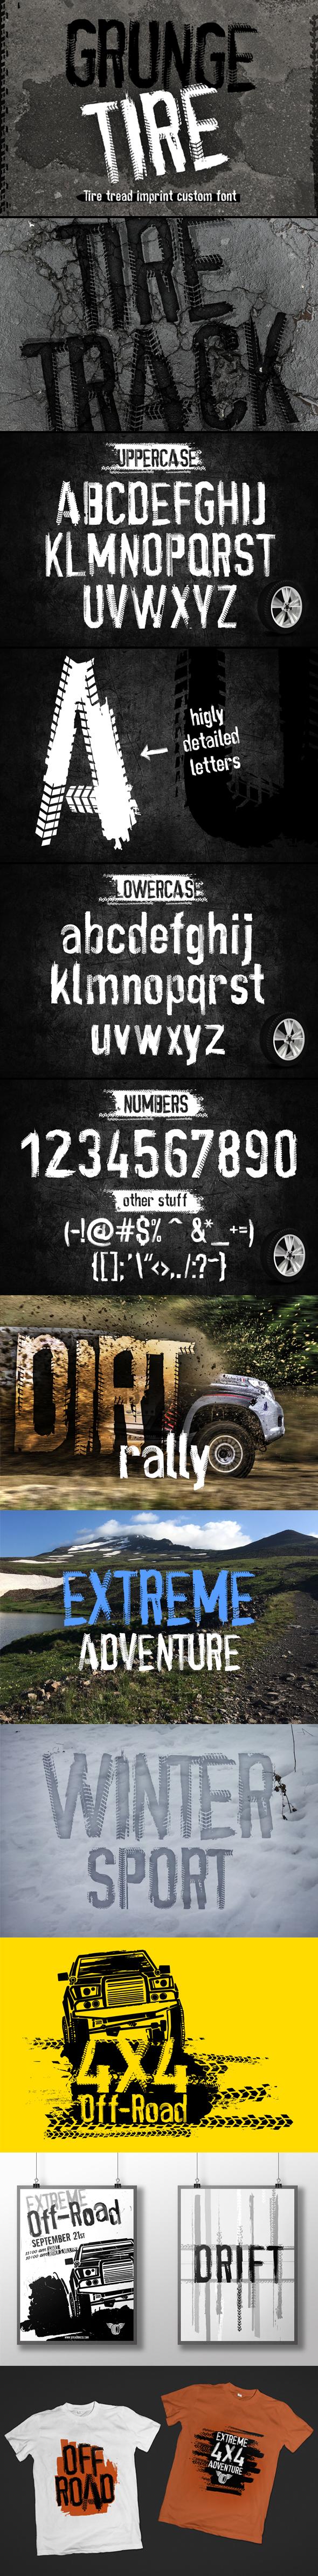 Grunge Tire Font - Grunge Decorative